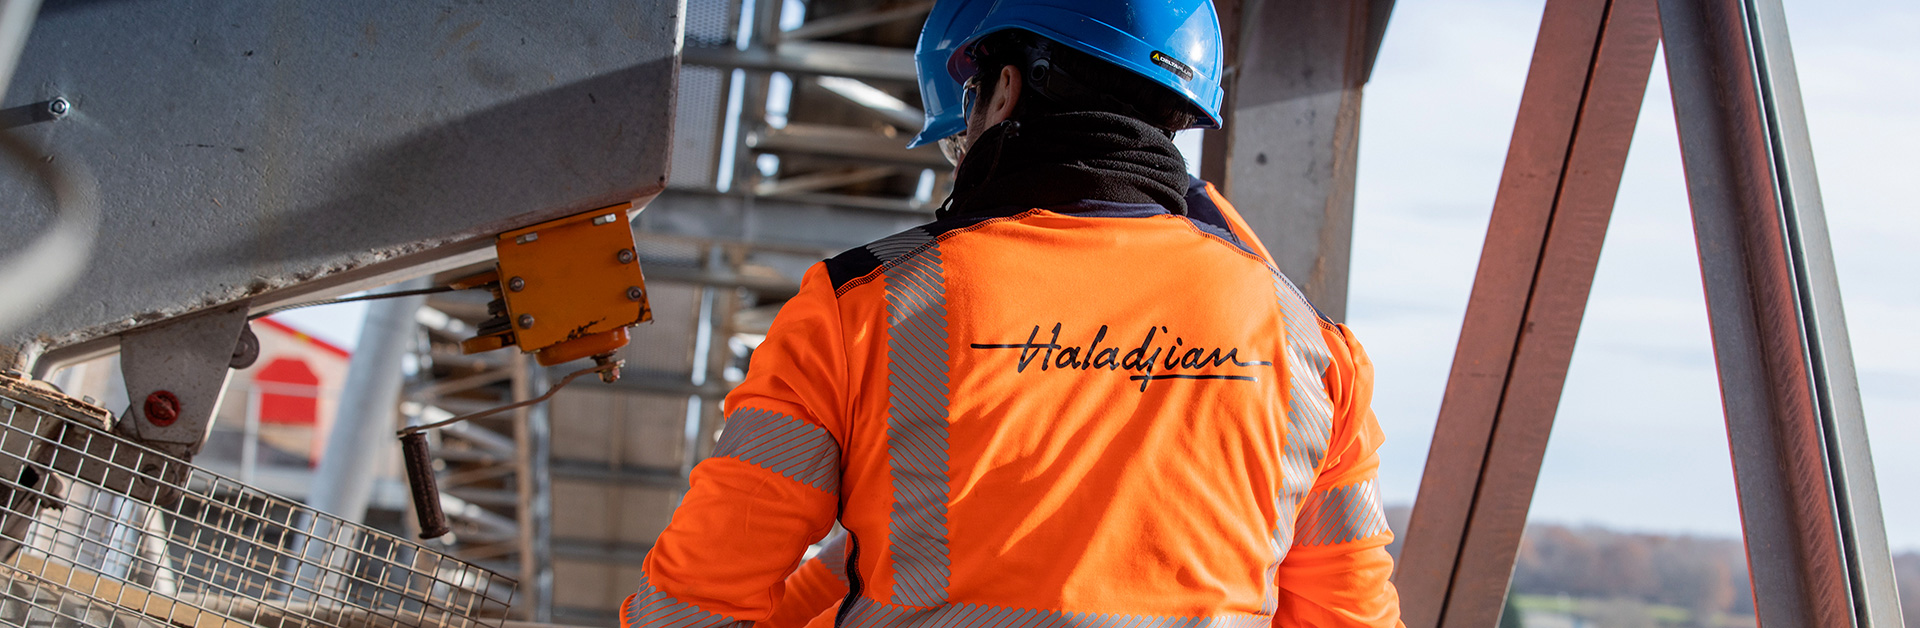 Maintenance Equipements Production De Granulats